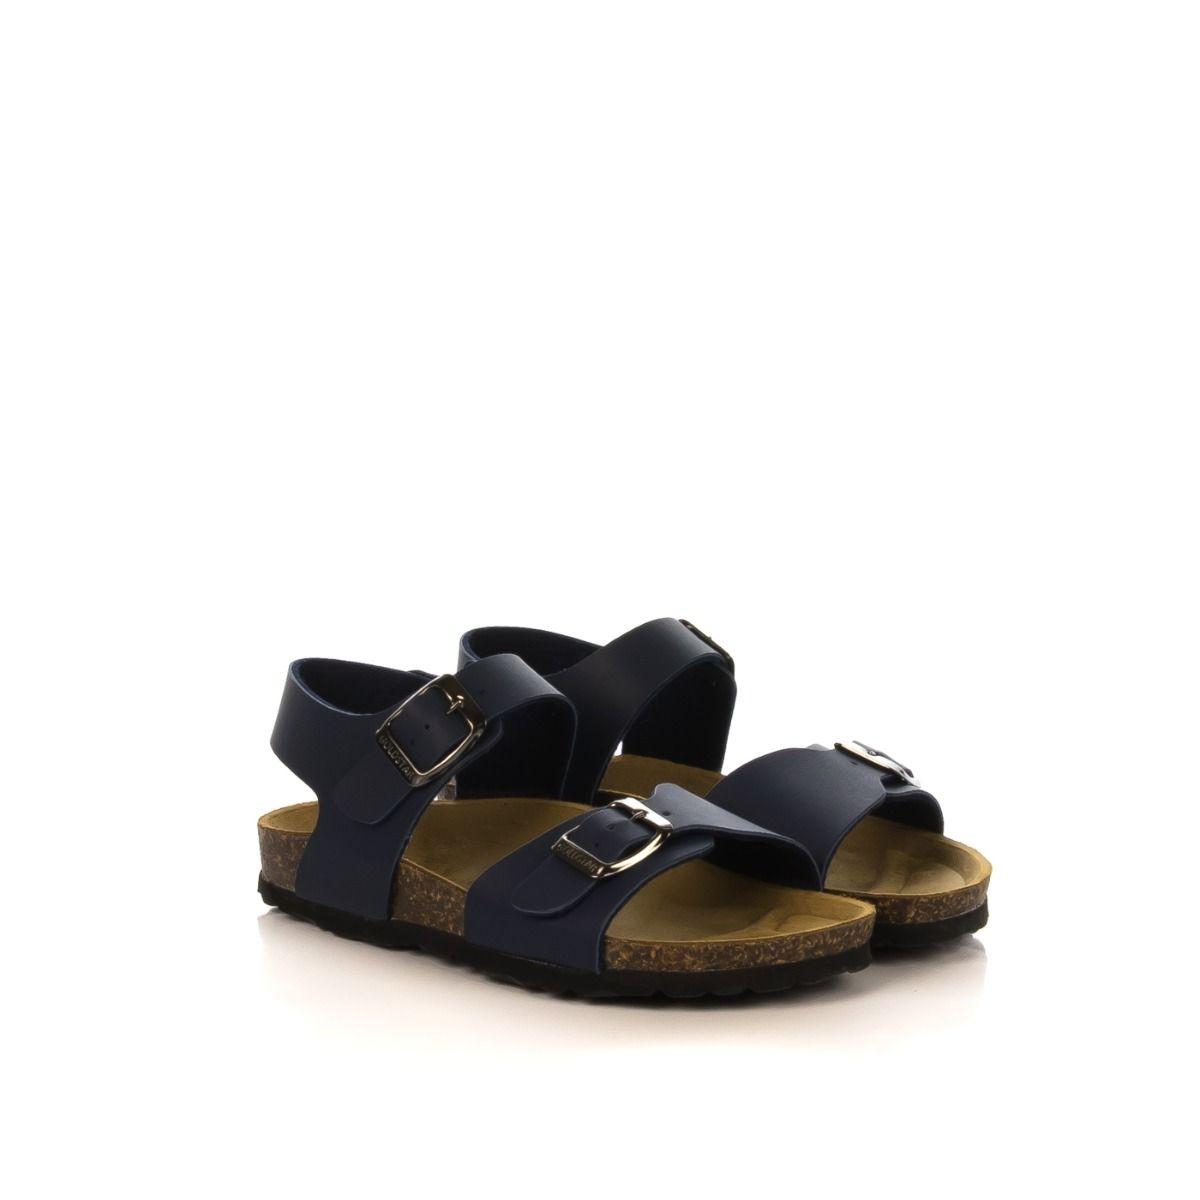 Goldstar 1805 Sandalo Fibbie Due Blu Bambino 8OXPNnwk0